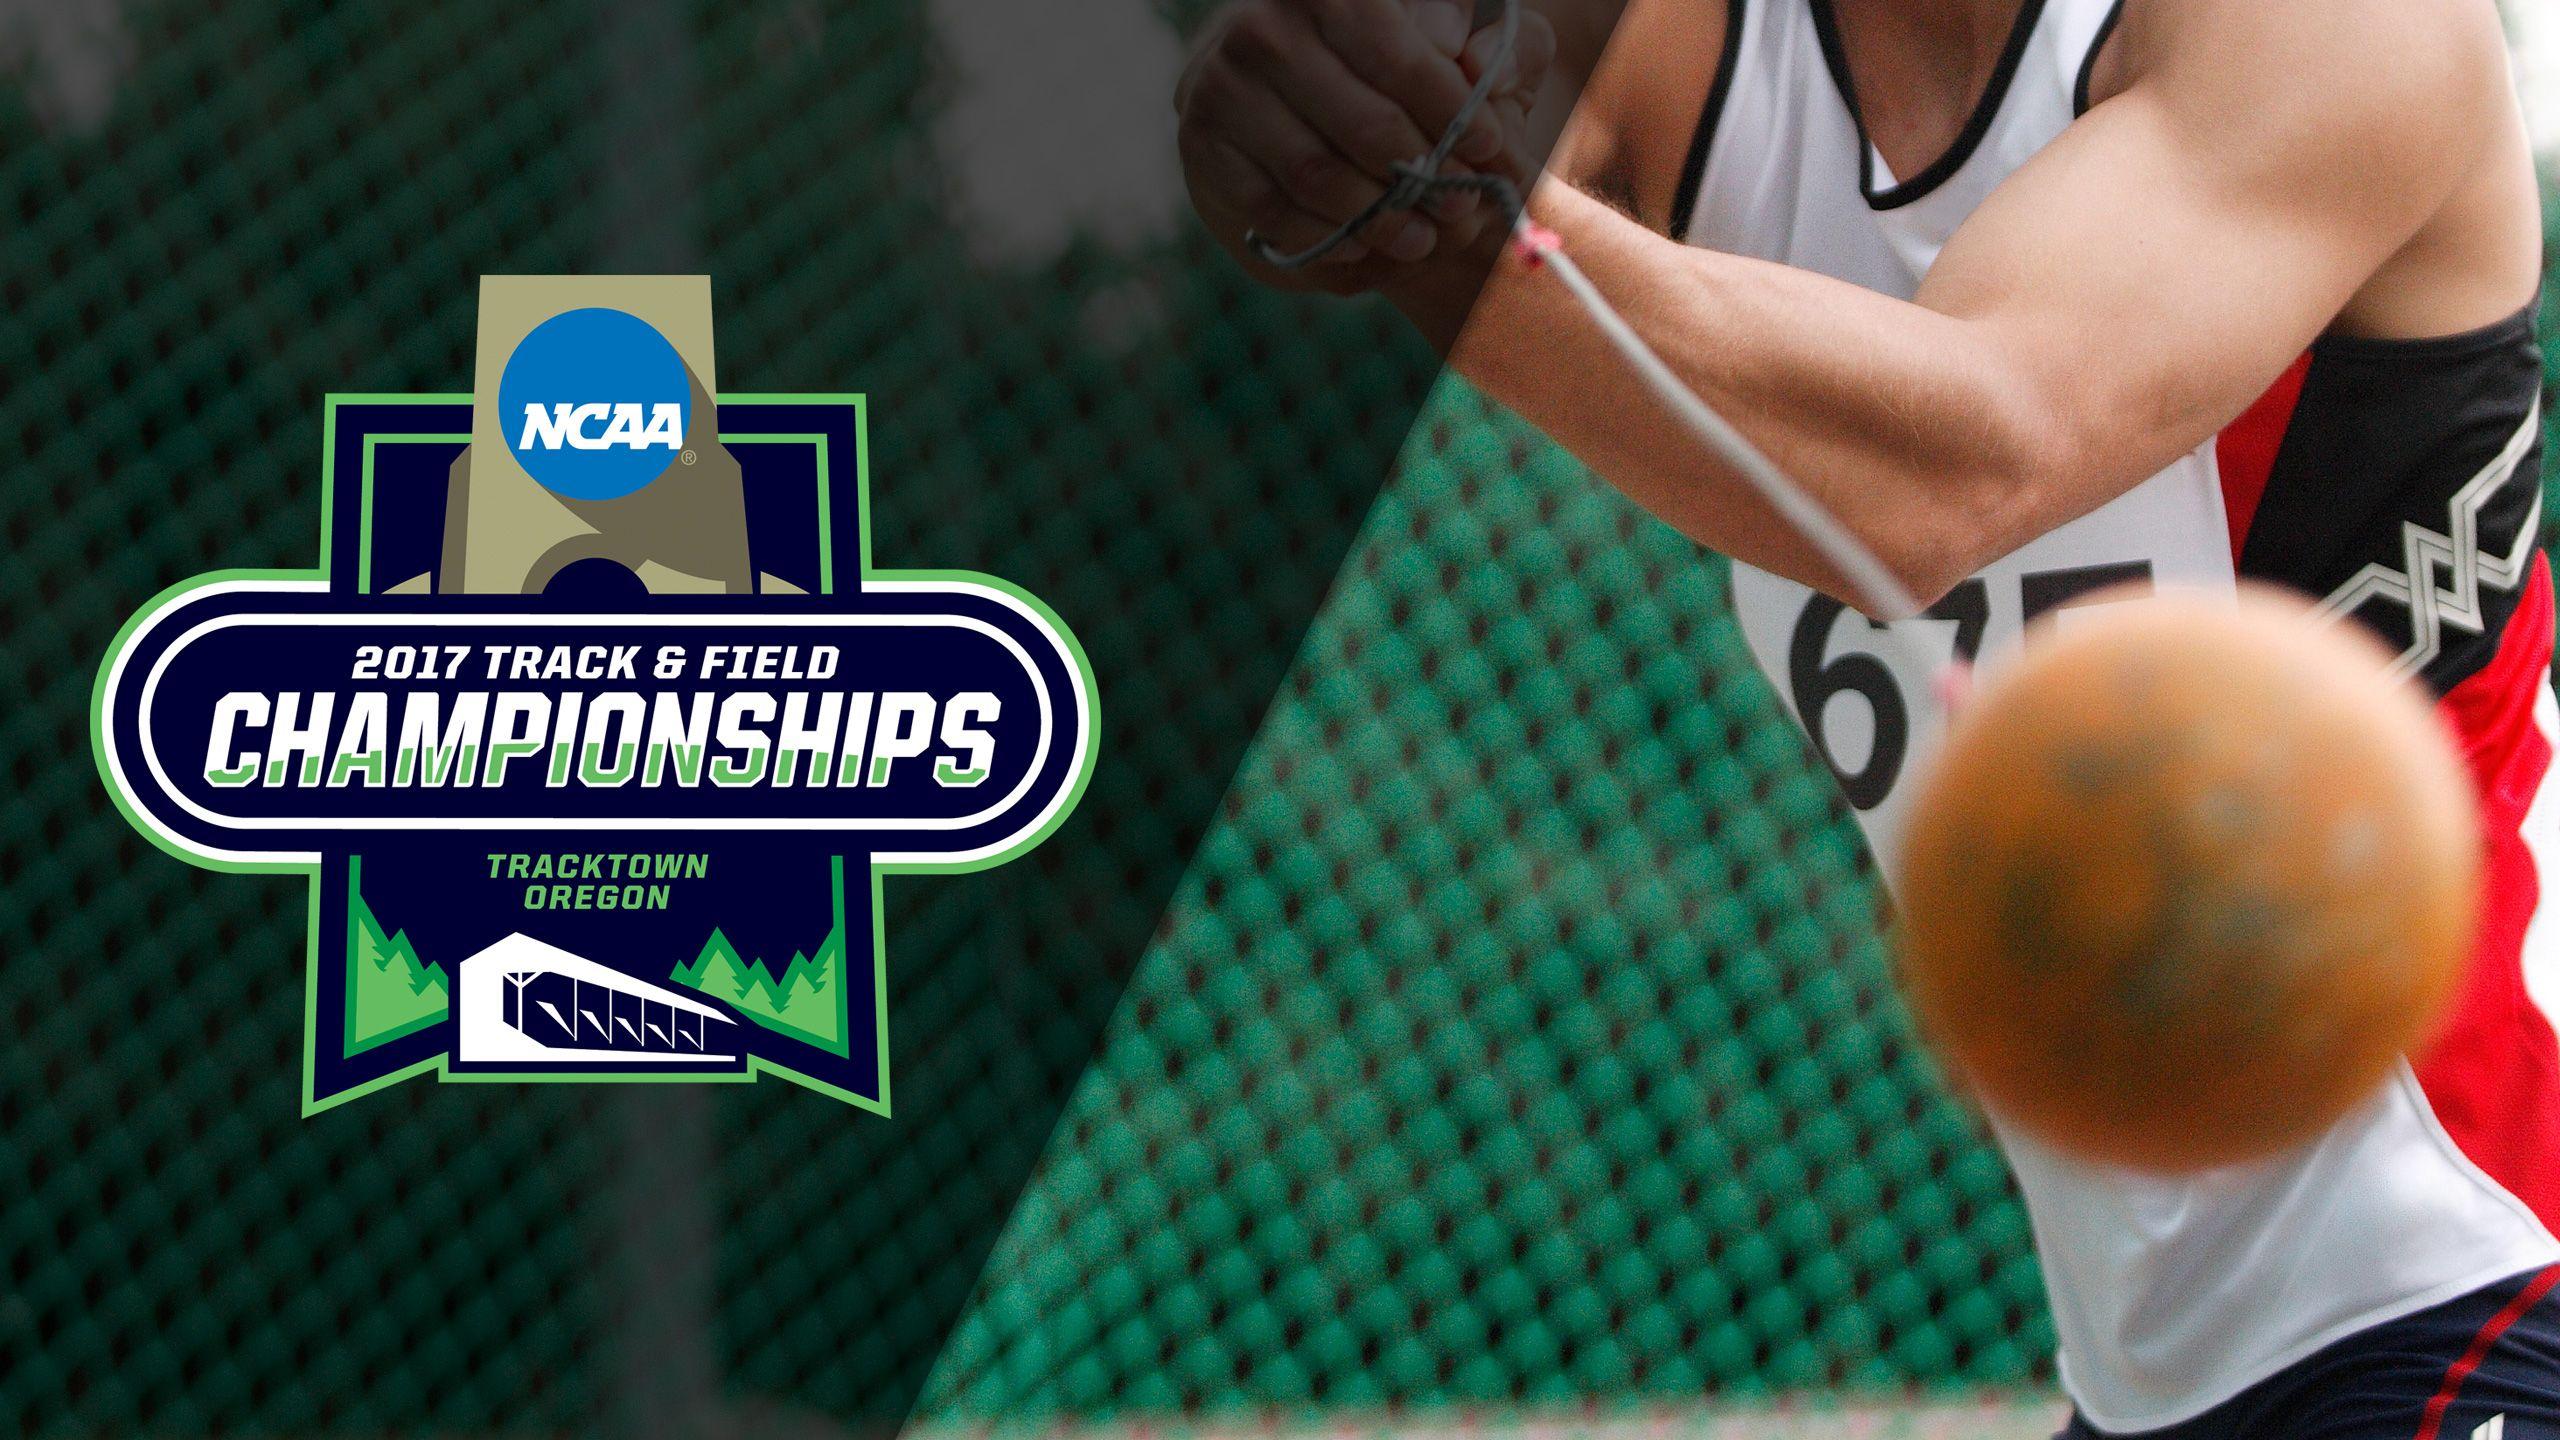 NCAA Track & Field Outdoor Championships - Men's Hammer Throw Final